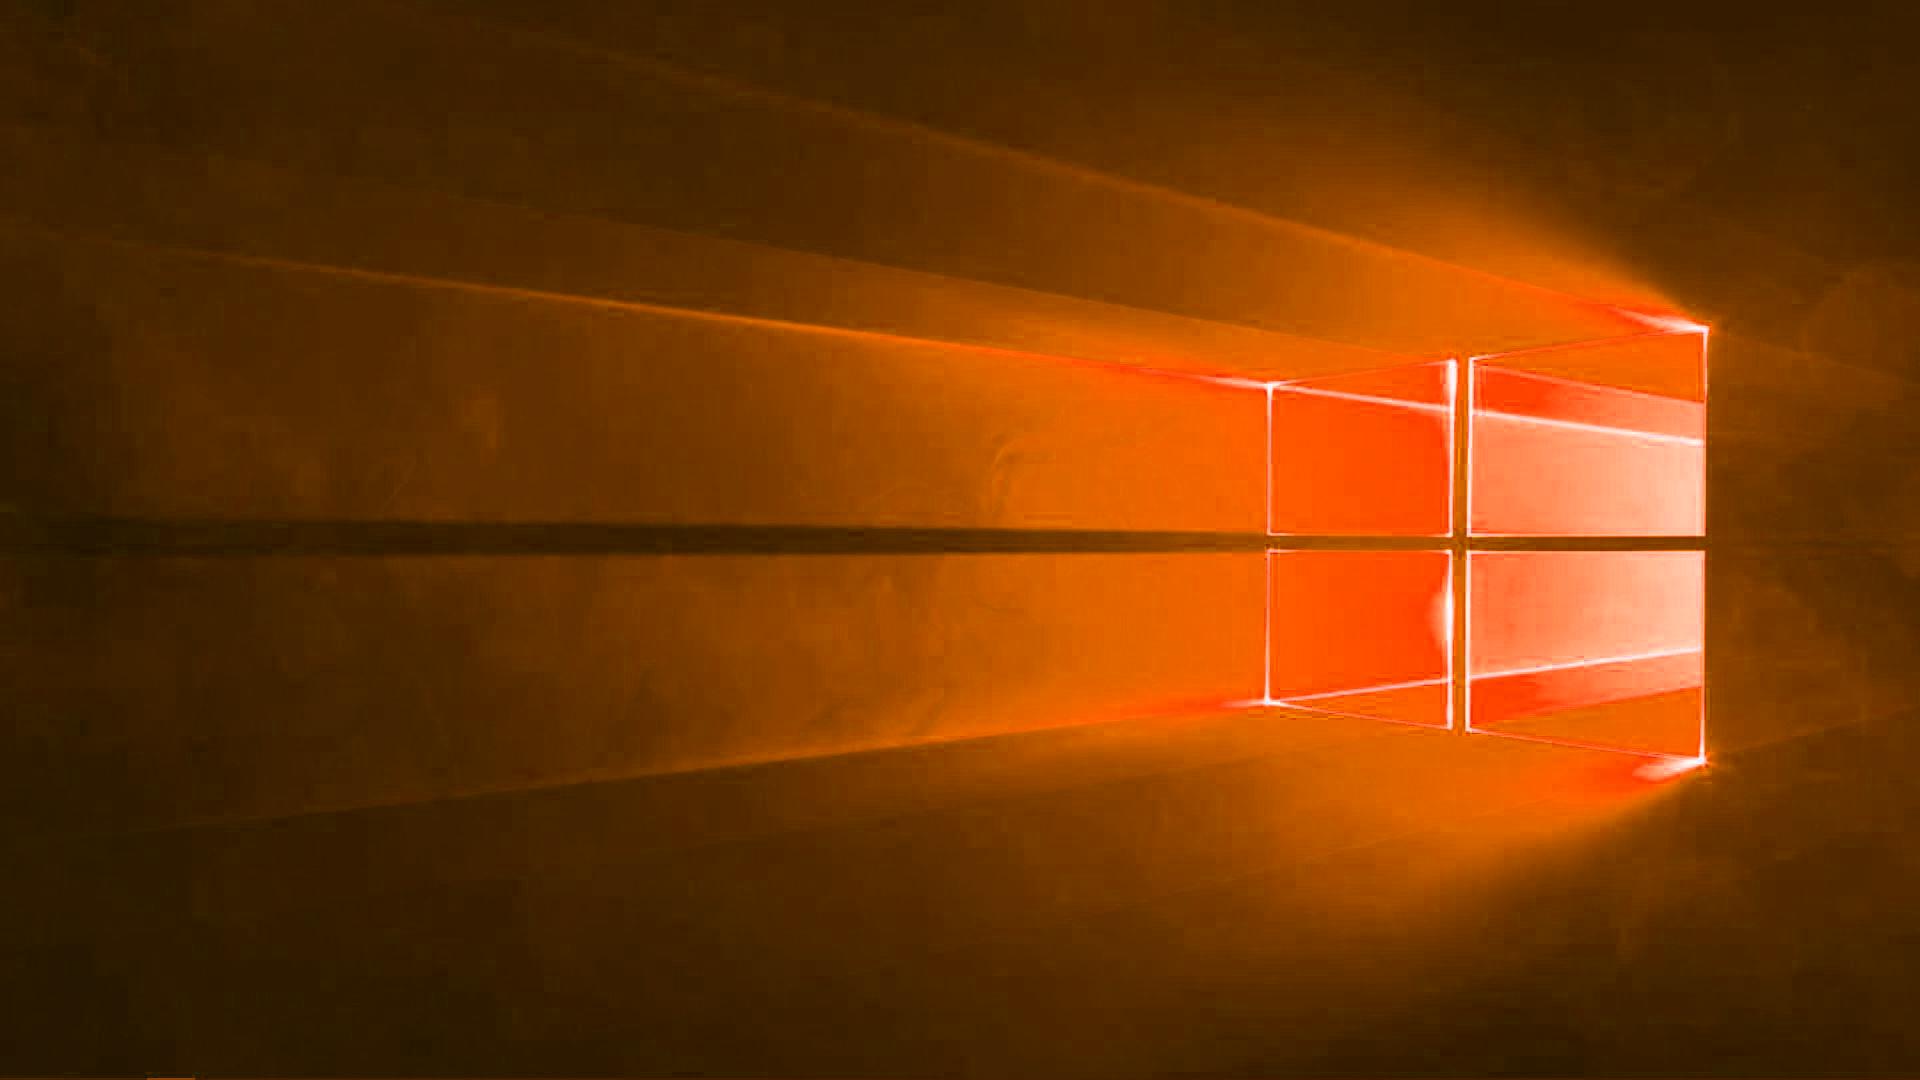 Windows 10 Red Wallpaper 1920x1080 Wallpaper Windows 10 Red Wallpaper Windows Wallpaper